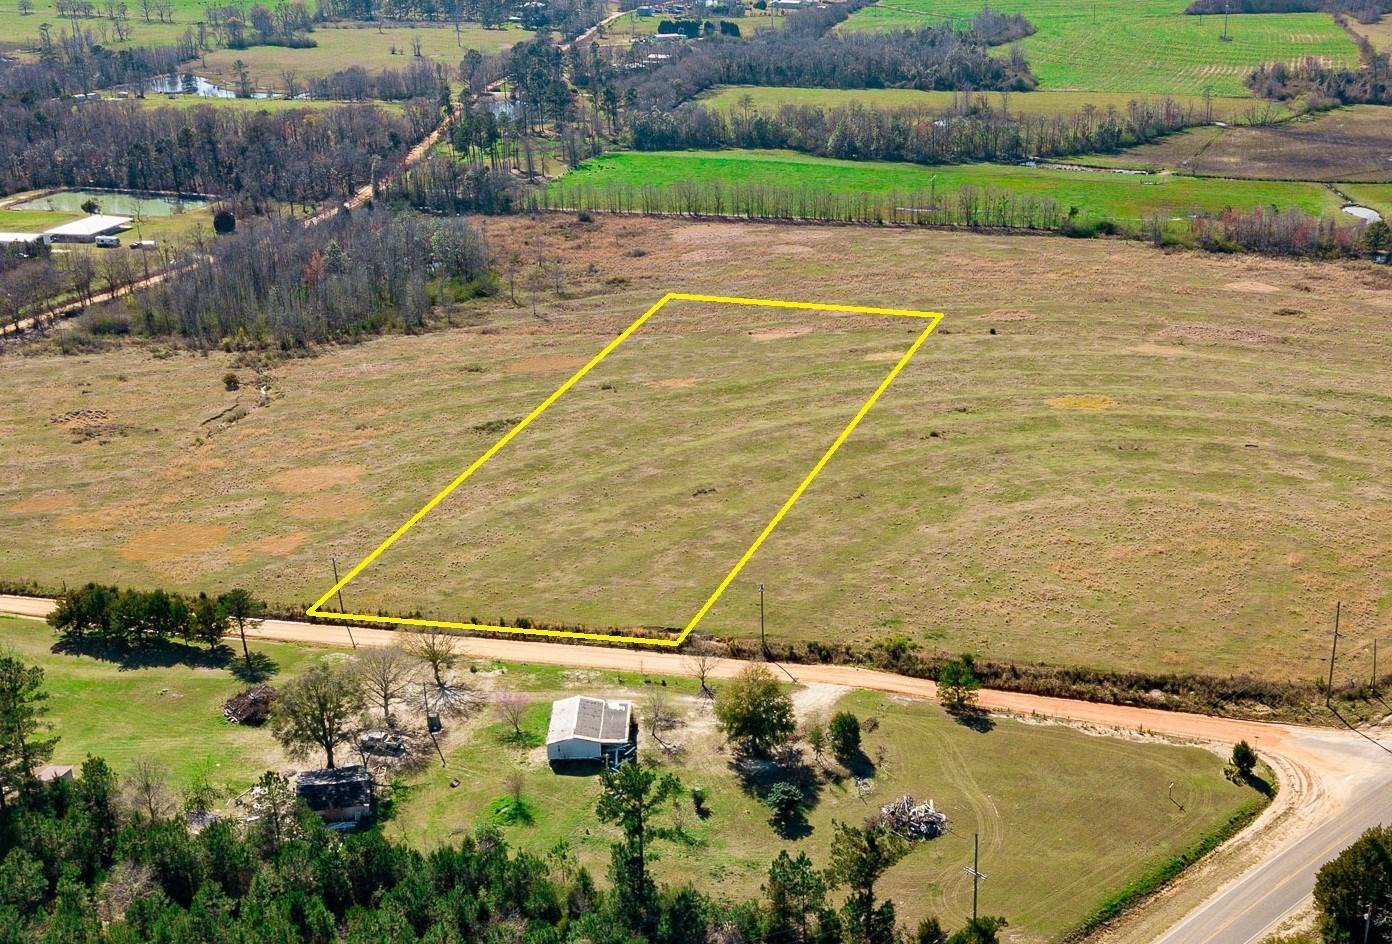 Slocomb Alabama Land for Sale Home site ear Dothan Alabama